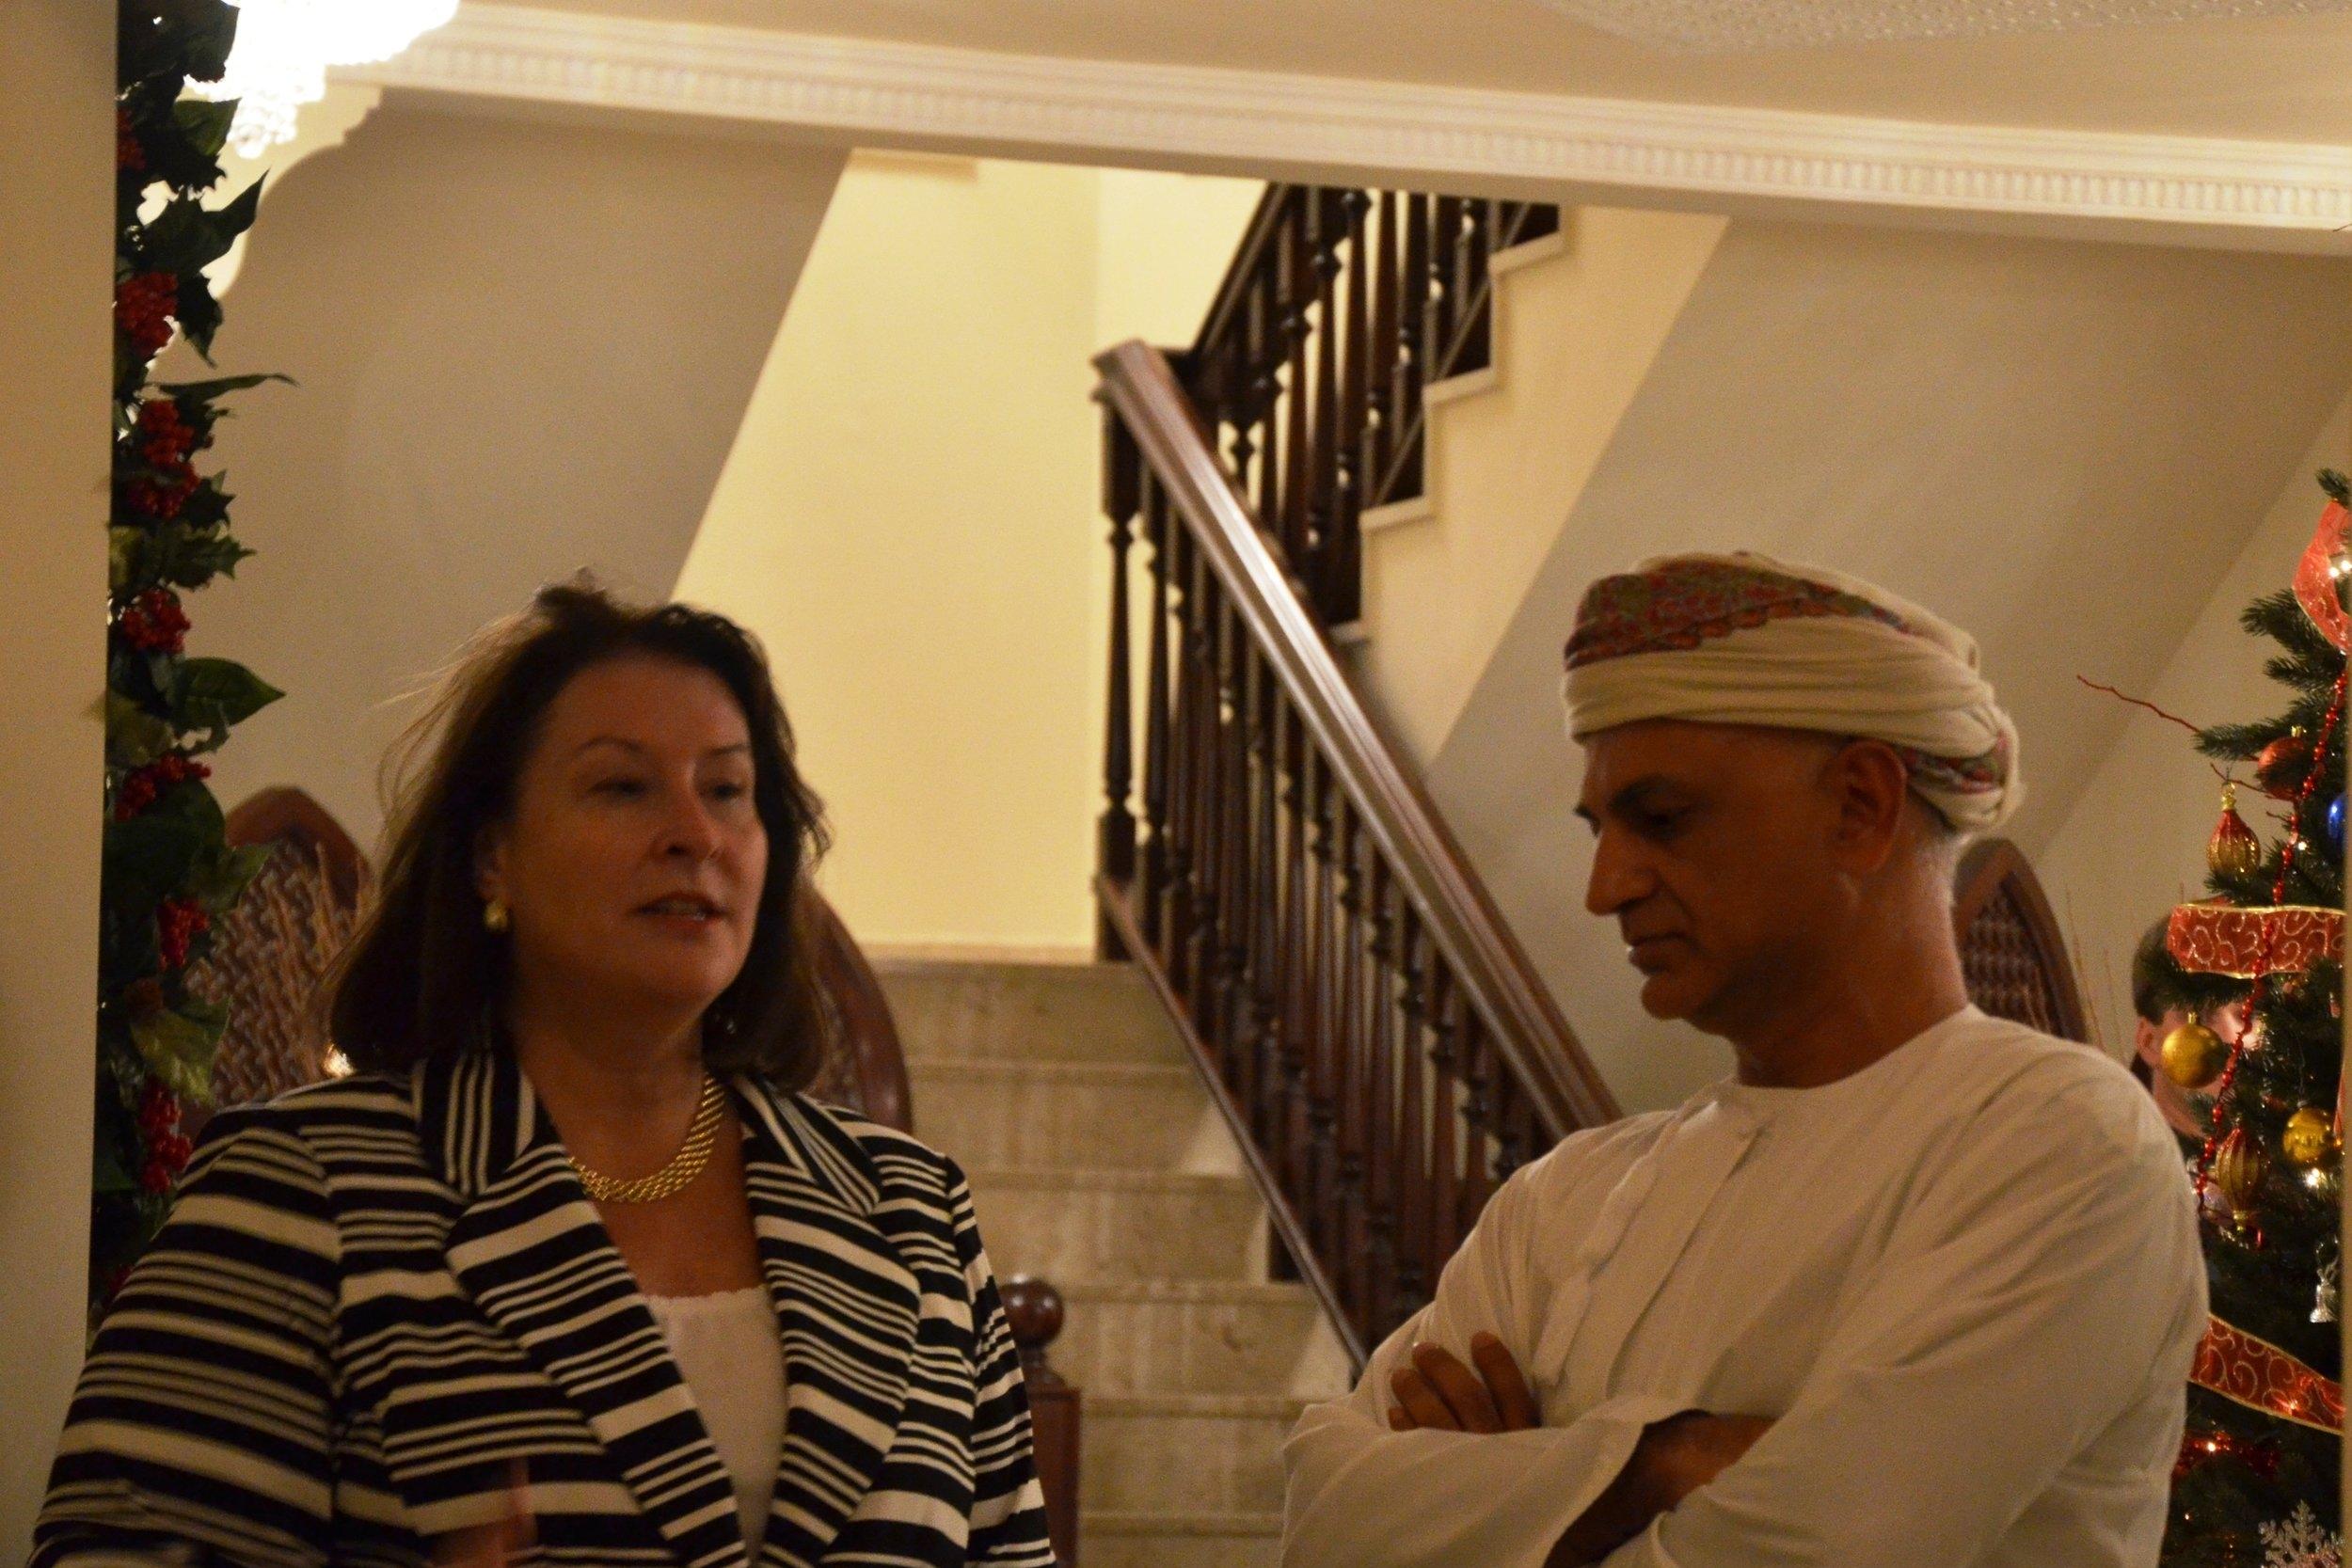 Ambassador Greta Holtz Welcomed our U.S. Delegation to Her Home in Oman in 2014